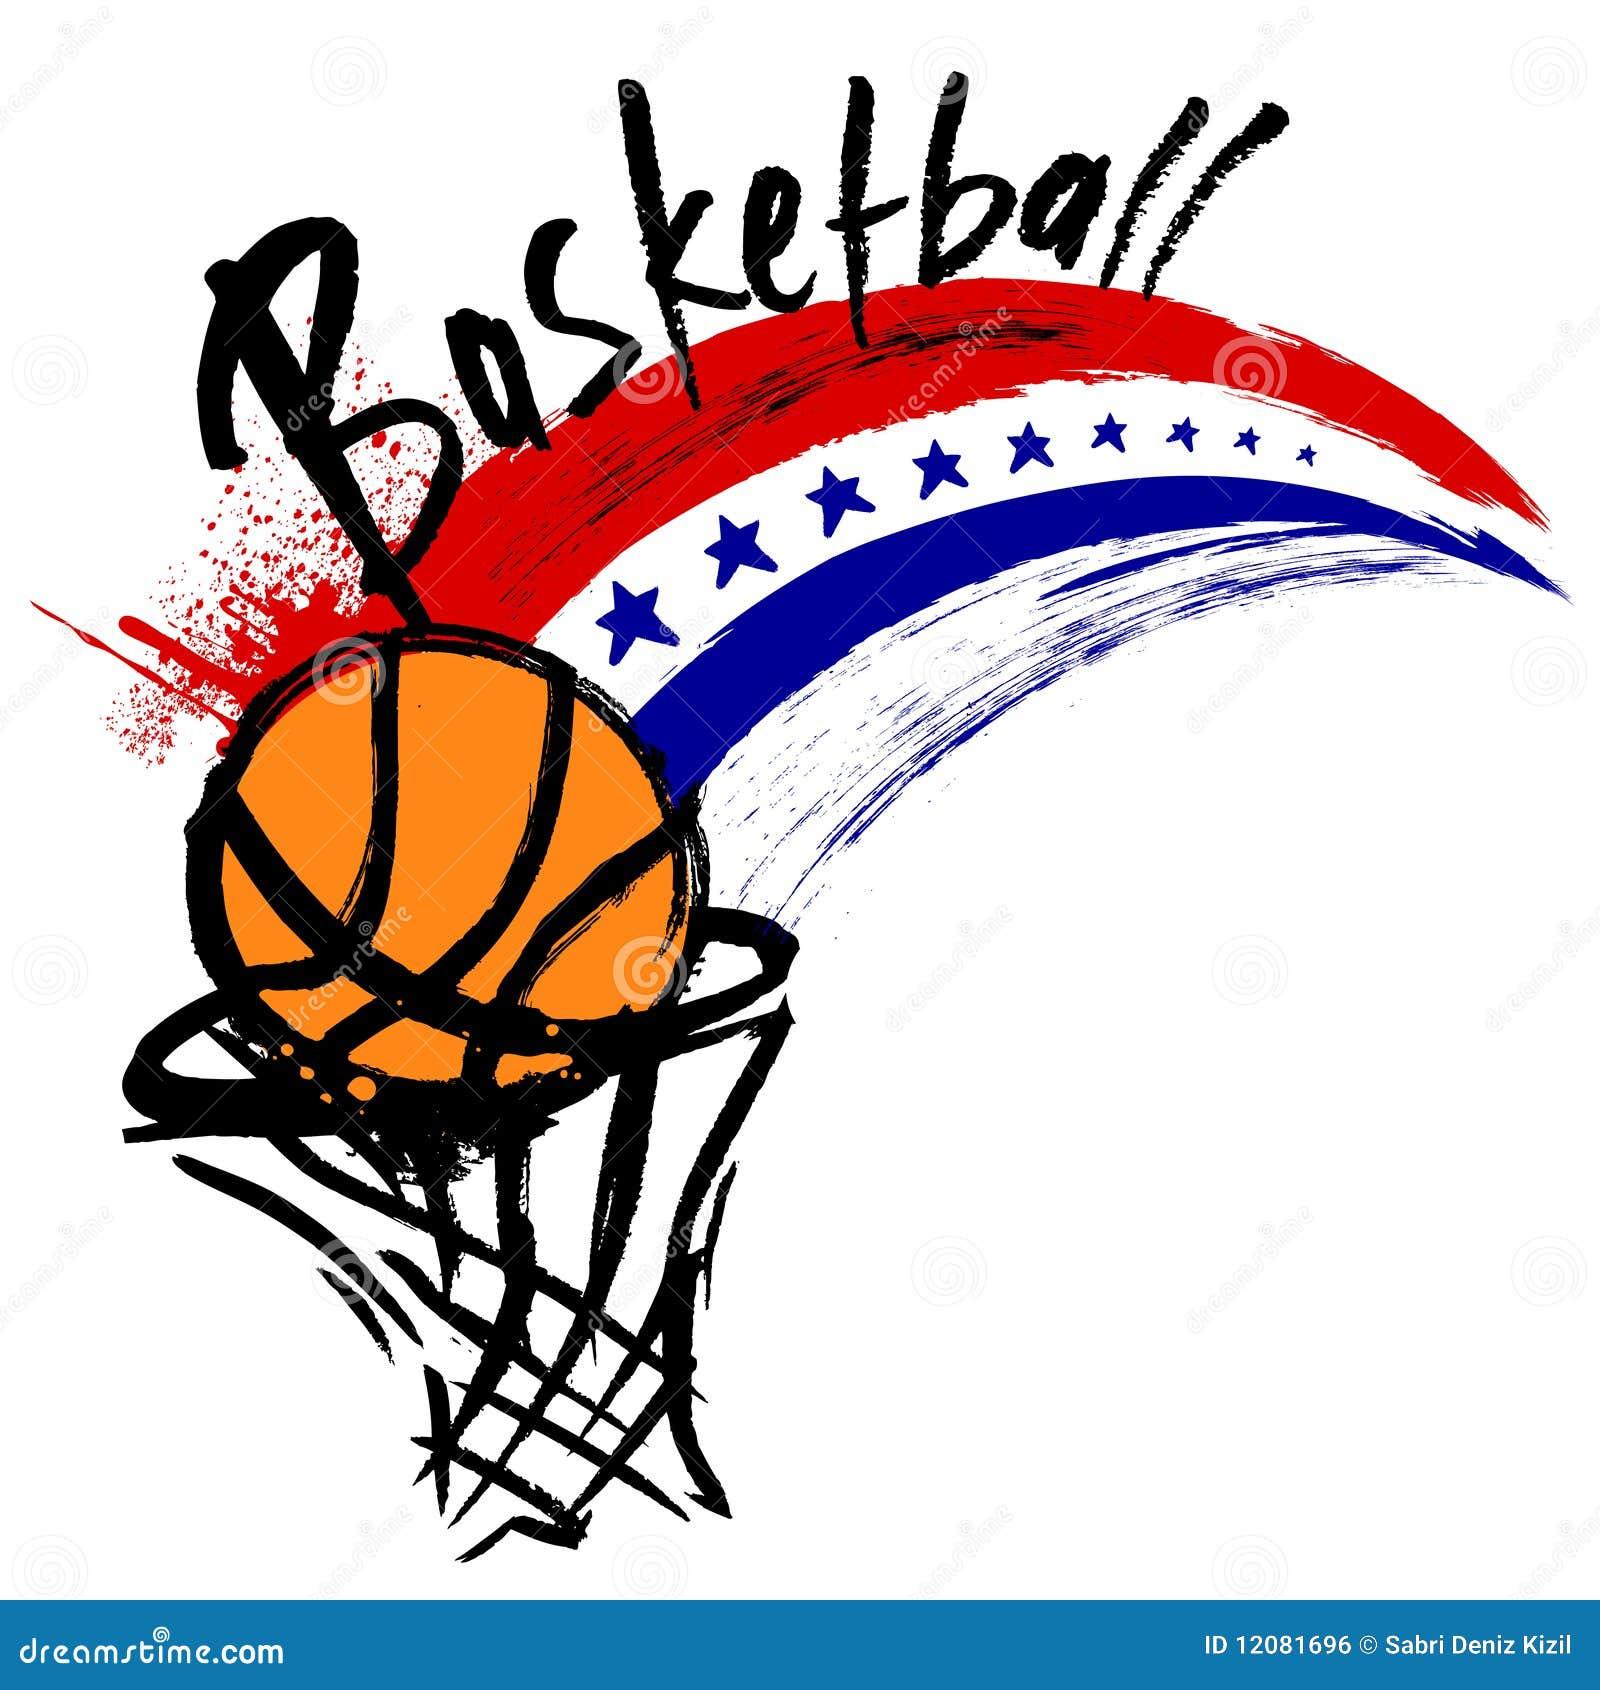 basketball design stock vector illustration of team 12081696